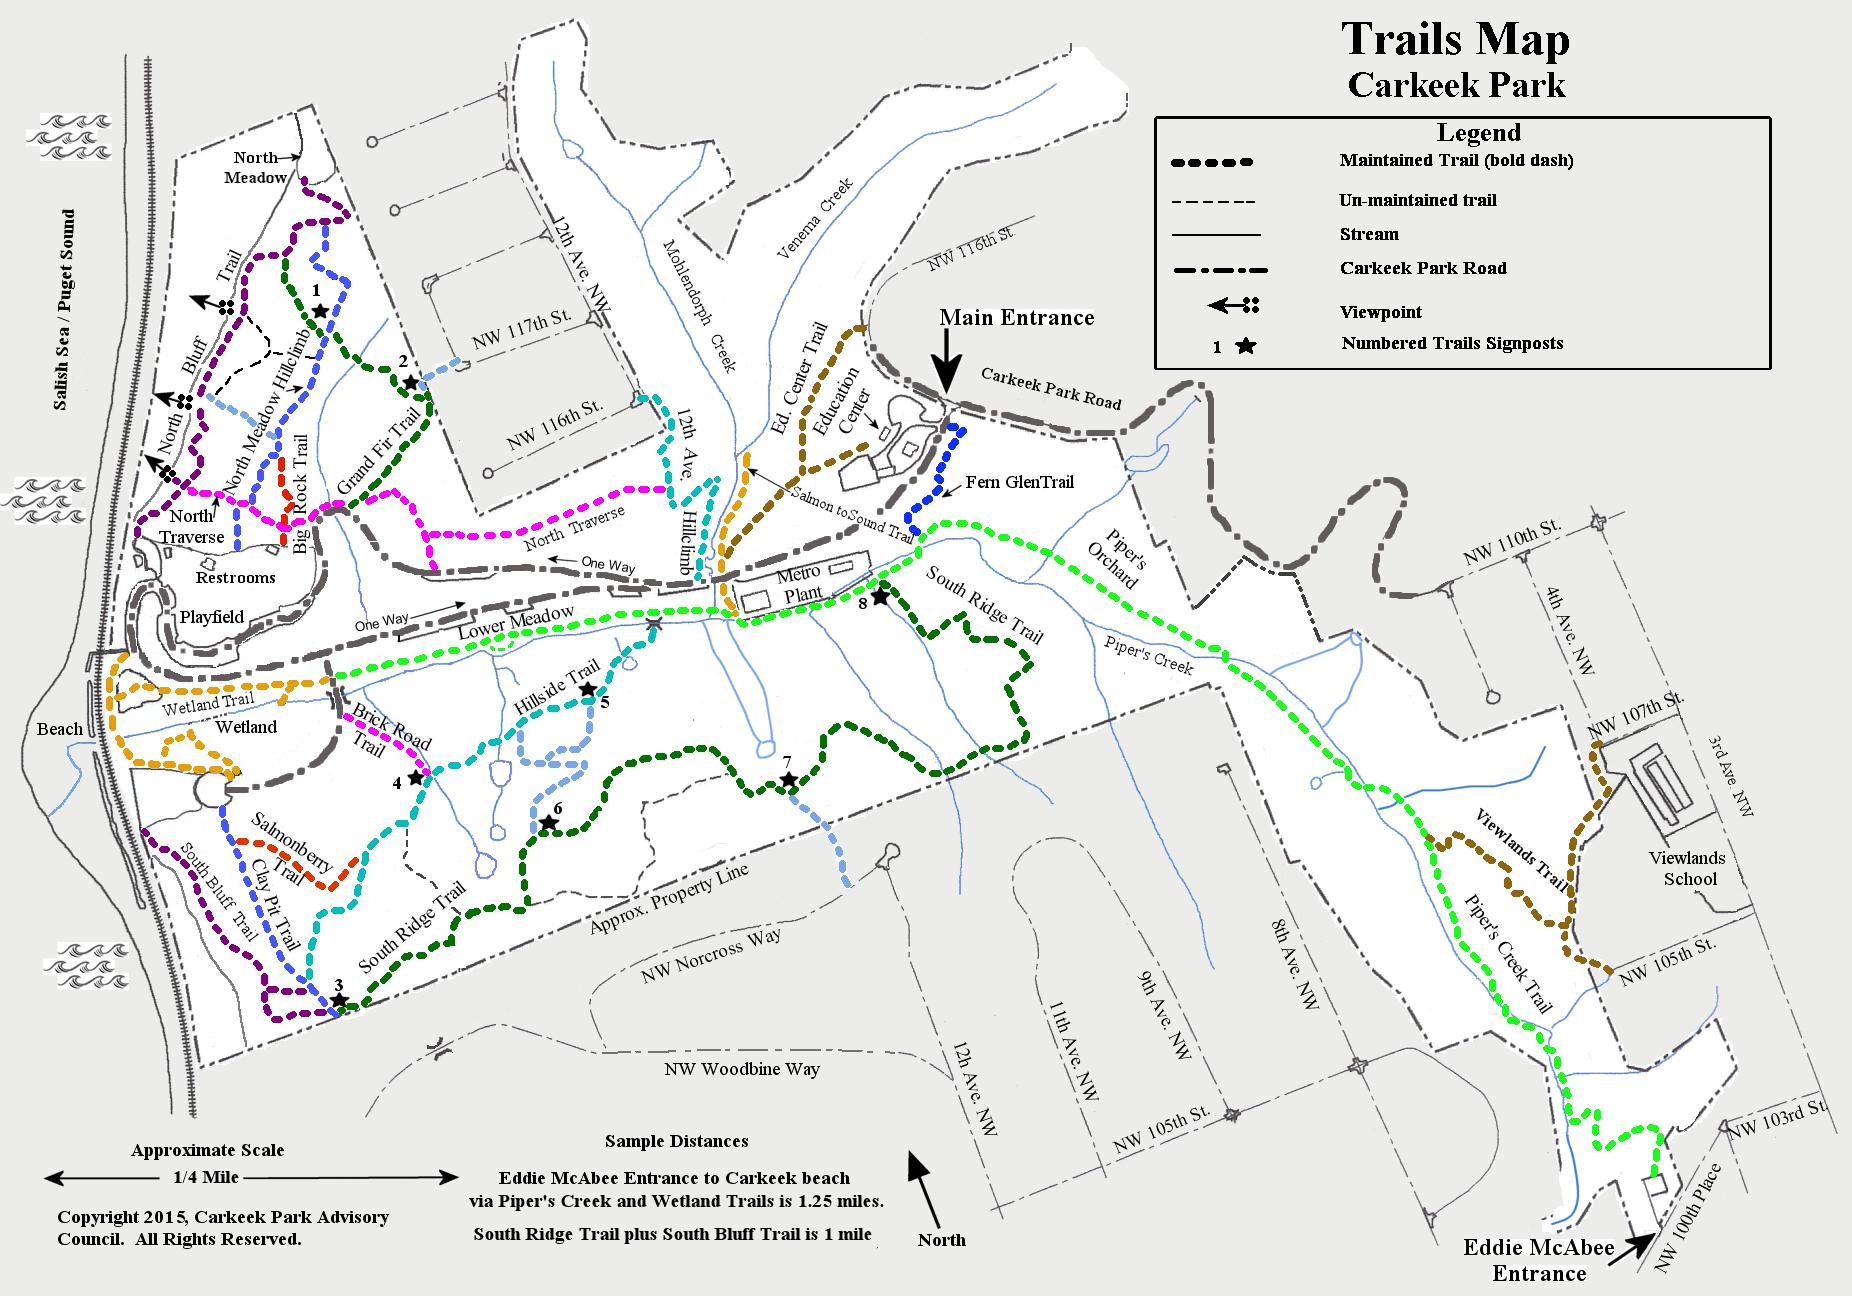 Carkeek Park Map Trails Map | Carkeek Park